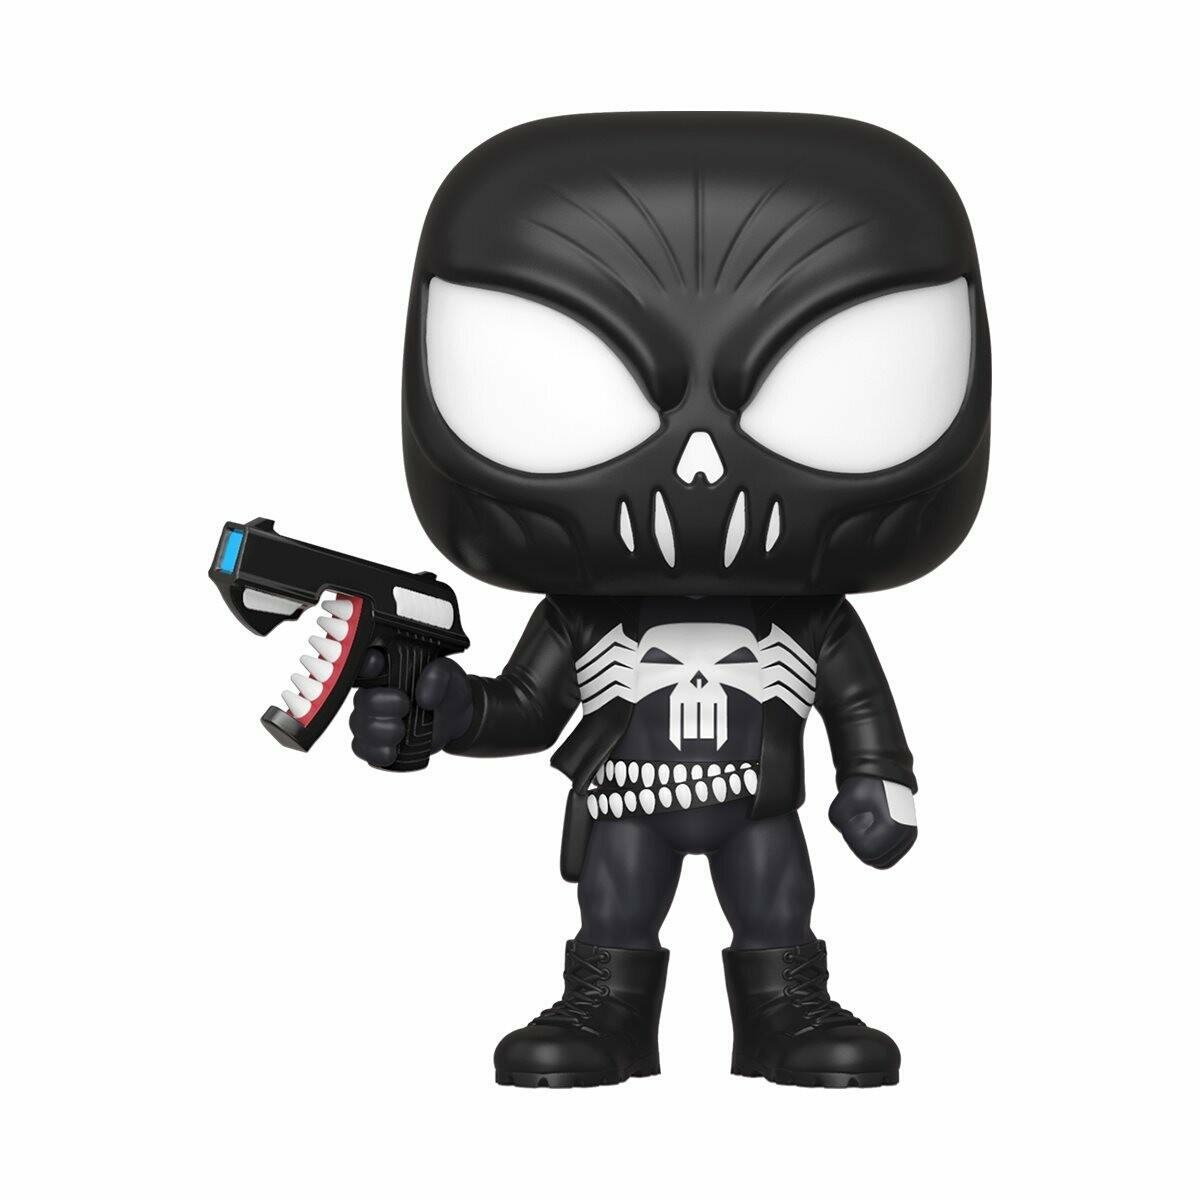 Marvel Venomized Punisher Pop! Vinyl Figure